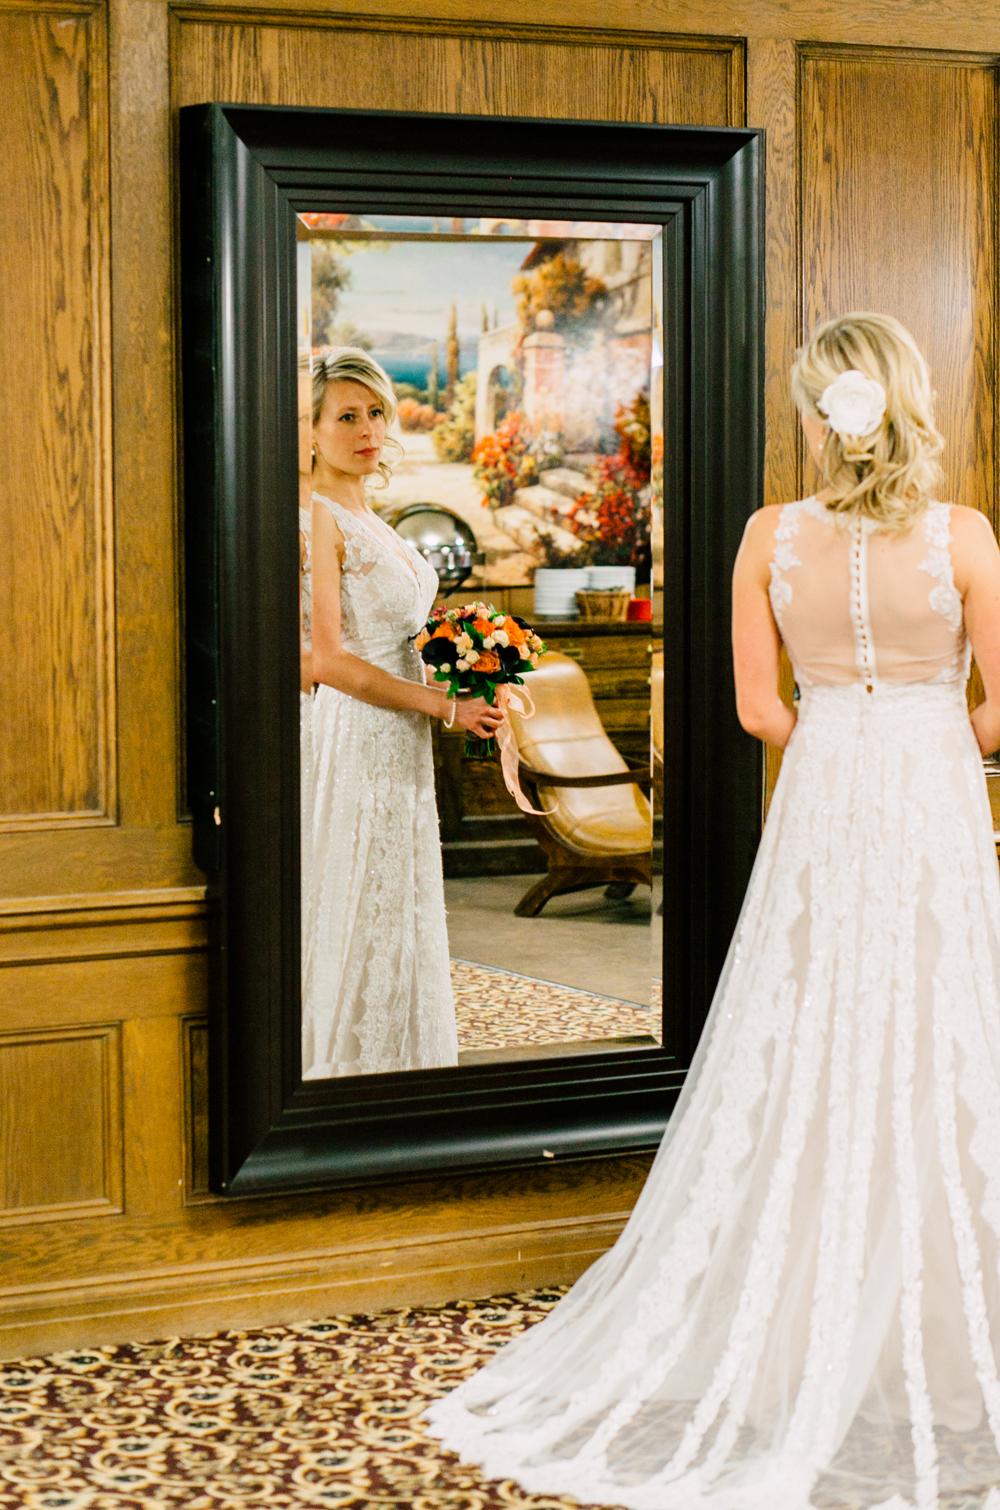 010-bellingham-wedding-photographer-lairmont-manor-katheryn-moran-stephanie-mark.jpg